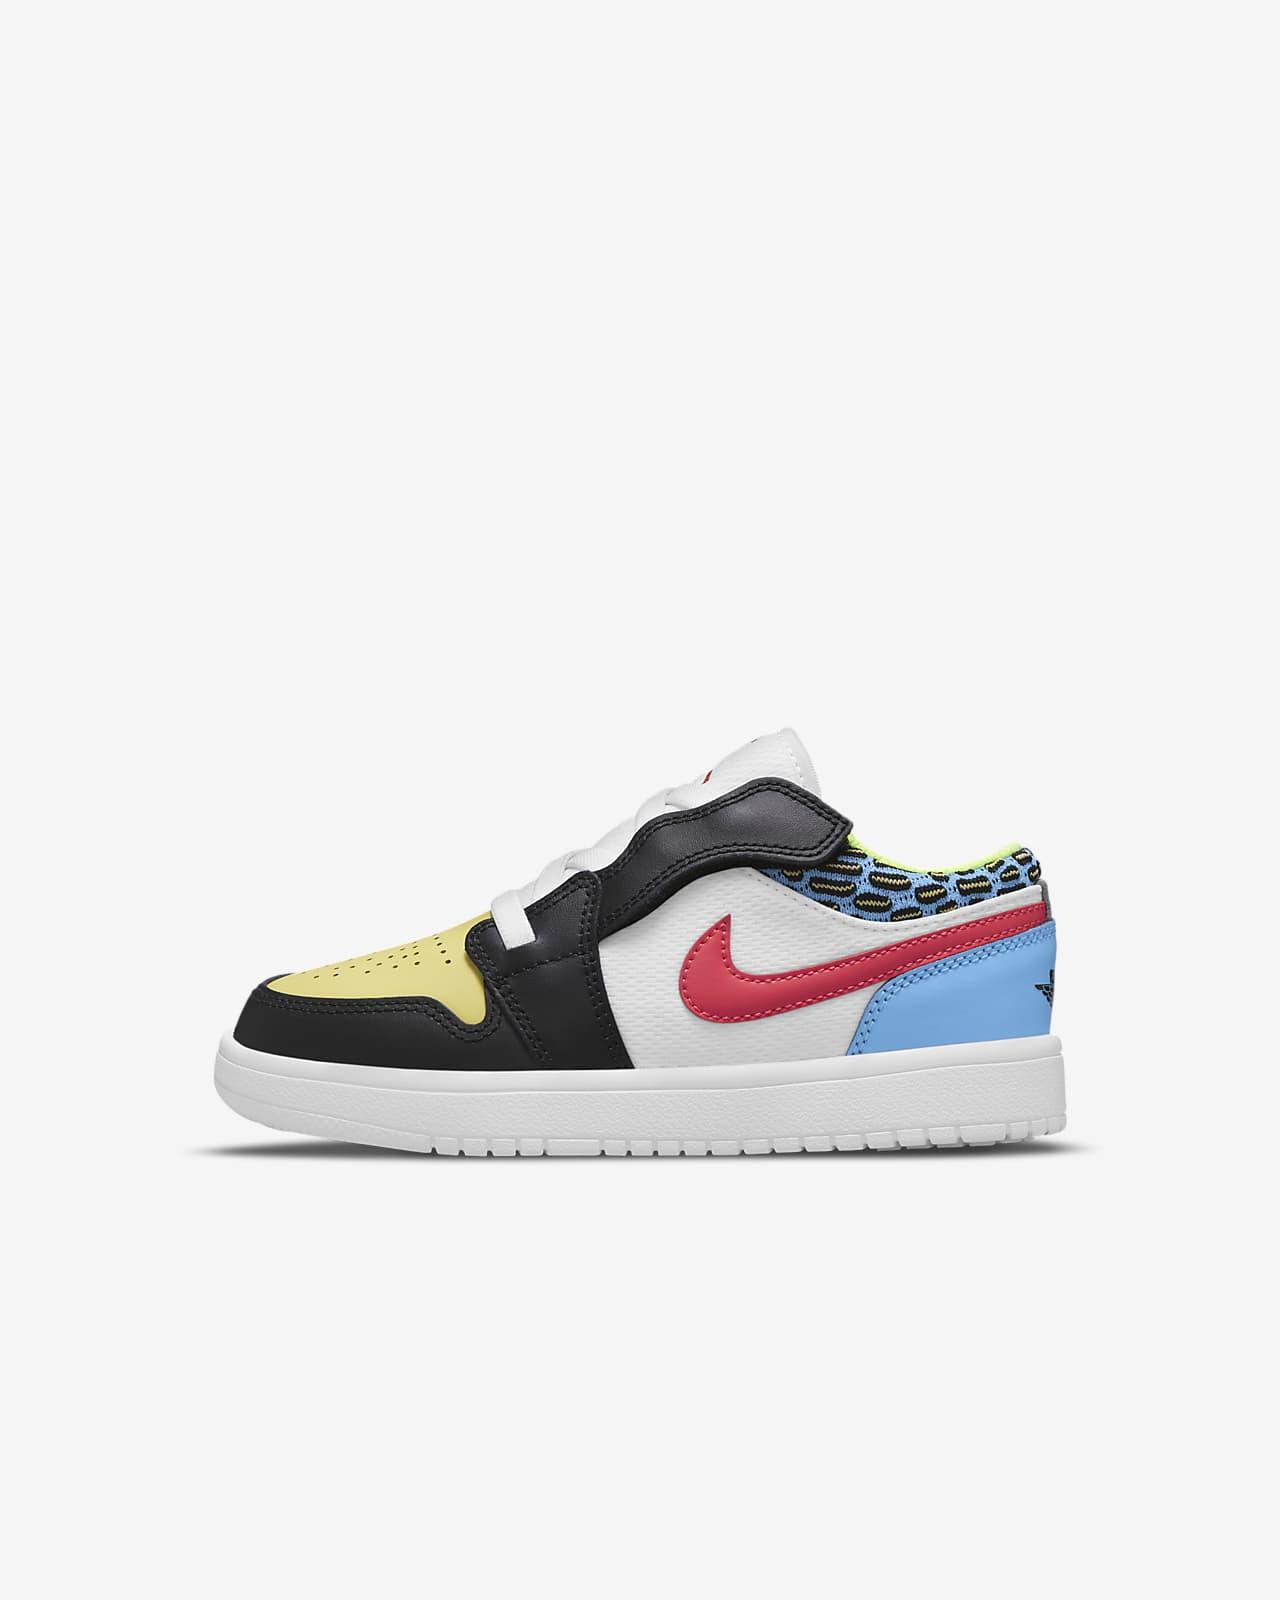 Jordan 1 低筒小童鞋款